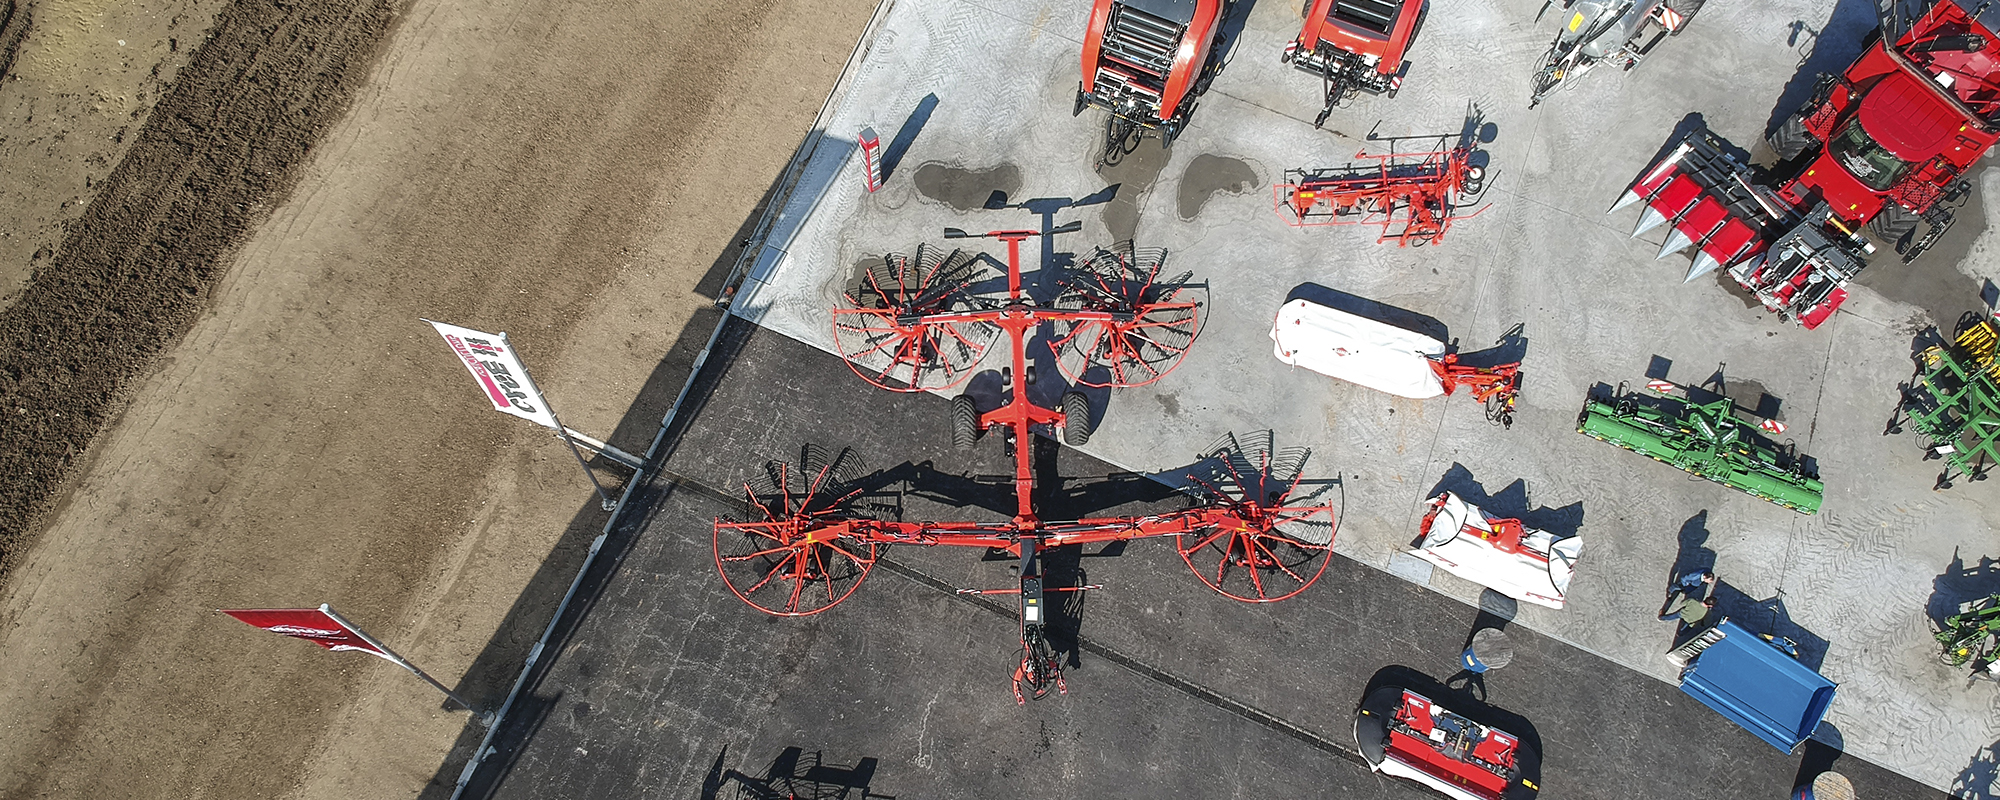 Söllinger Landtechnik, Hausmesse, Drohne